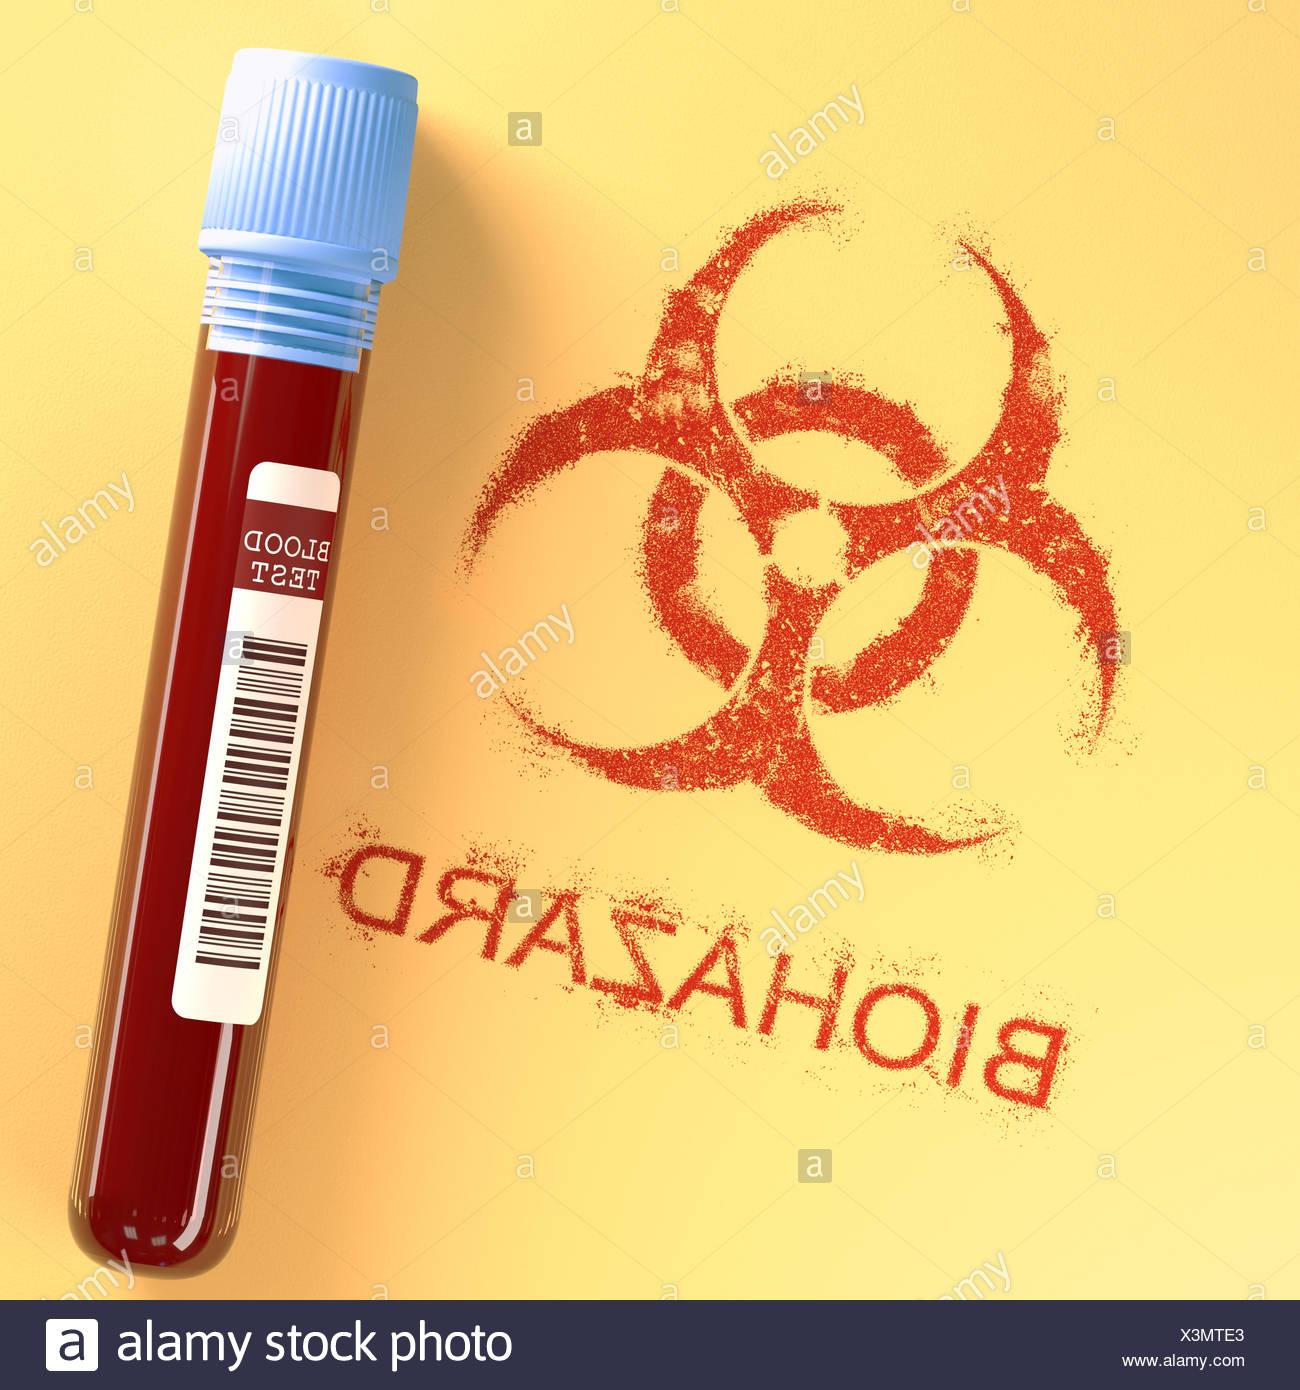 Test tube with contaminated blood, illustration. - Stock Image